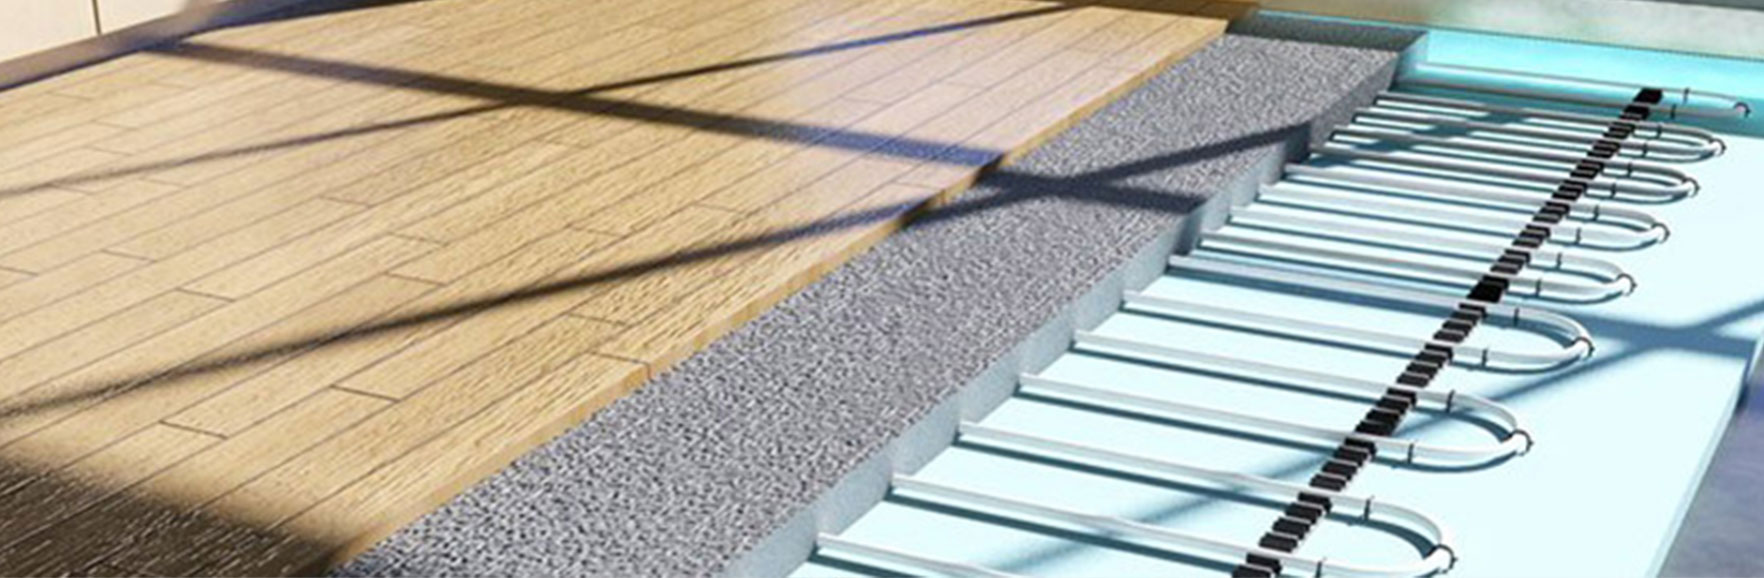 hight resolution of danfoss underfloor heating